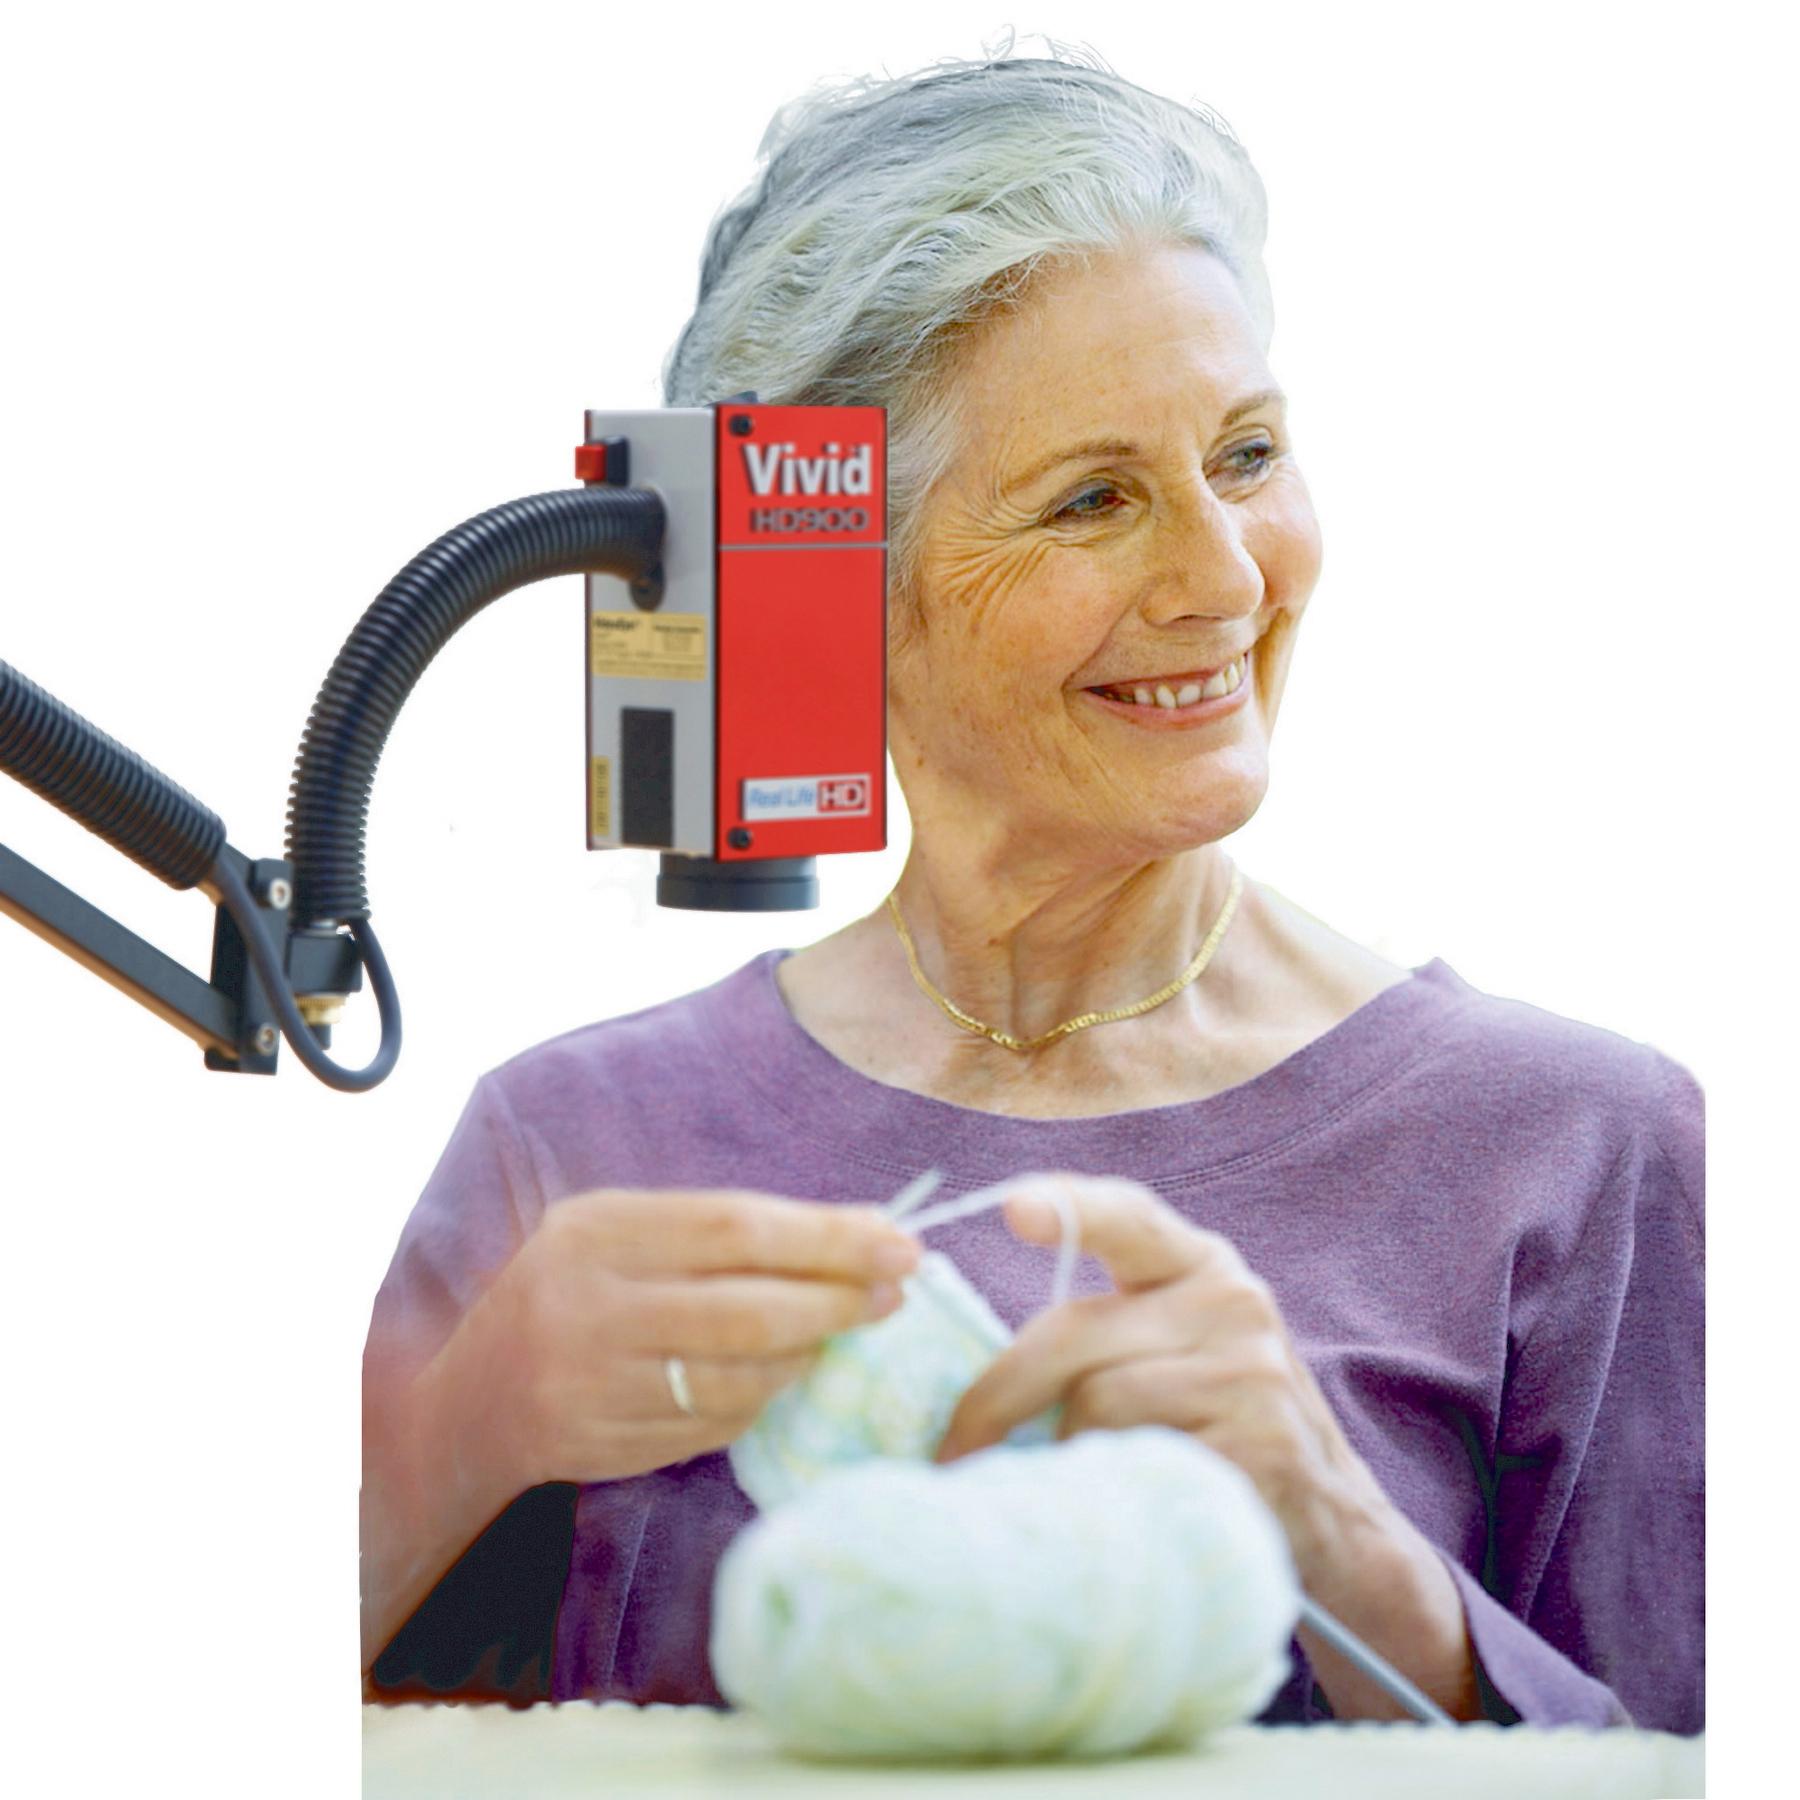 rds052417; 667x1000; Whiten teeth; woman knitting; RGB.jpg